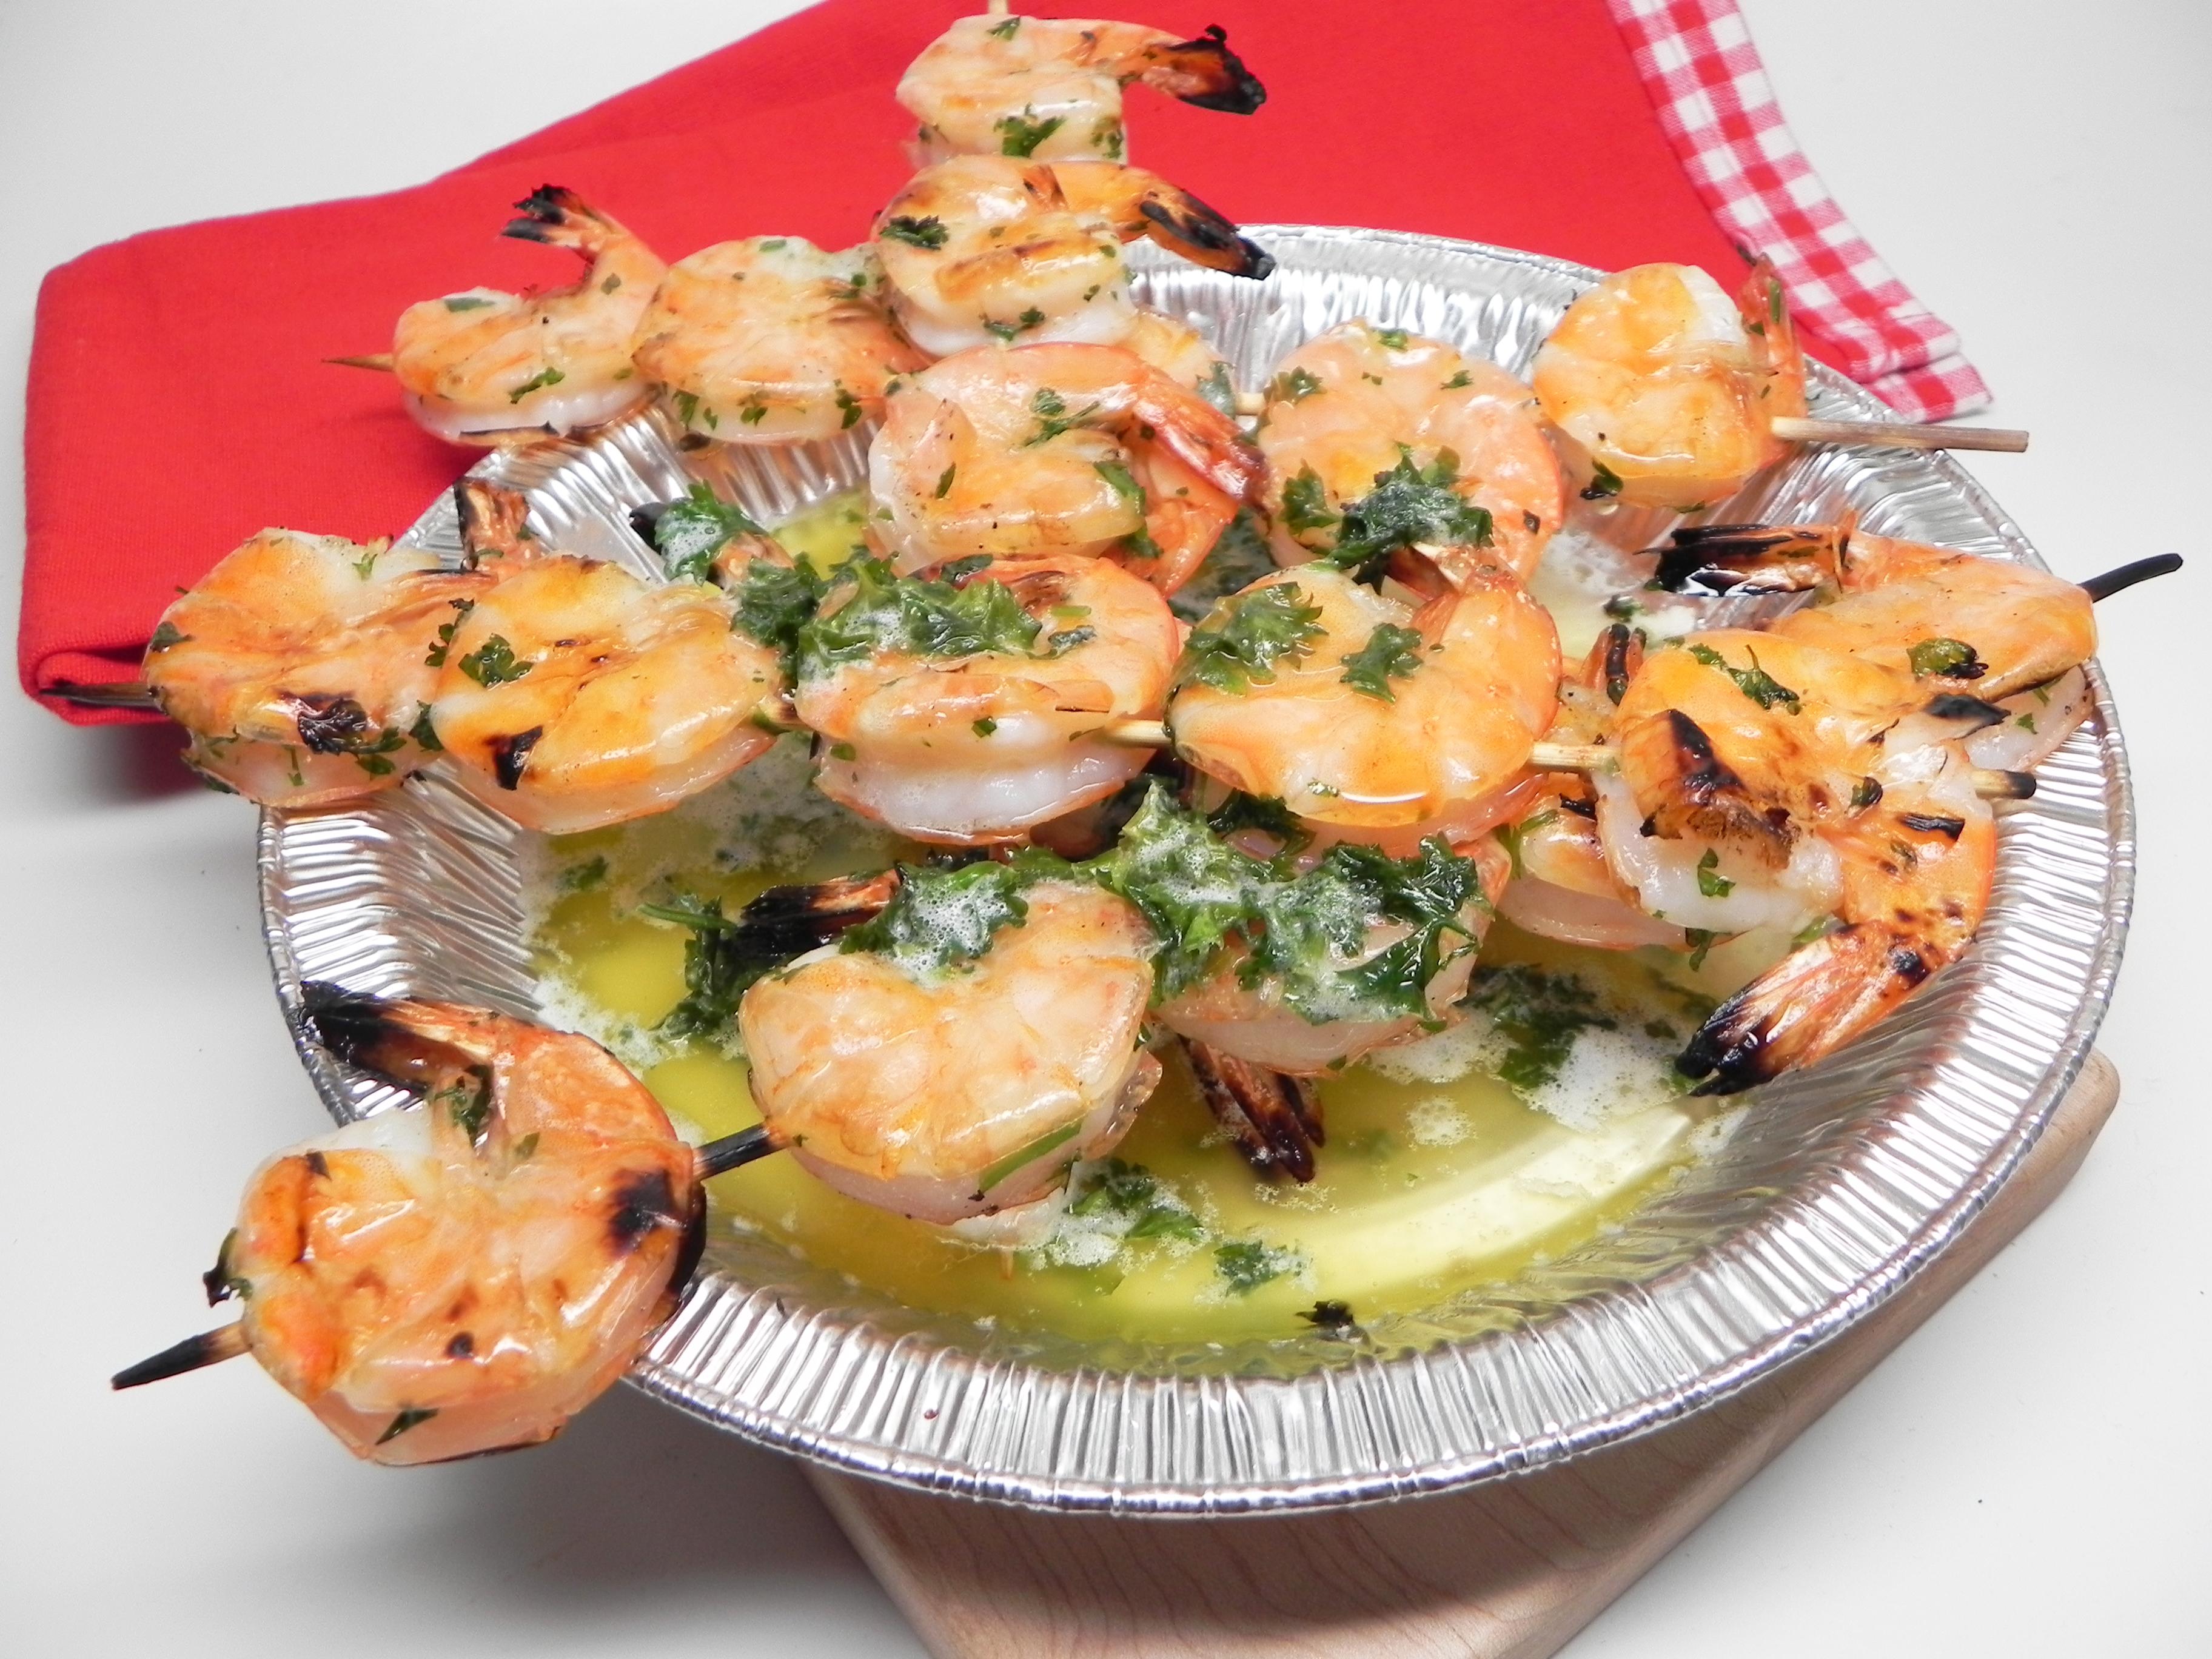 Our Backyard Grilled Garlic-Butter Shrimp